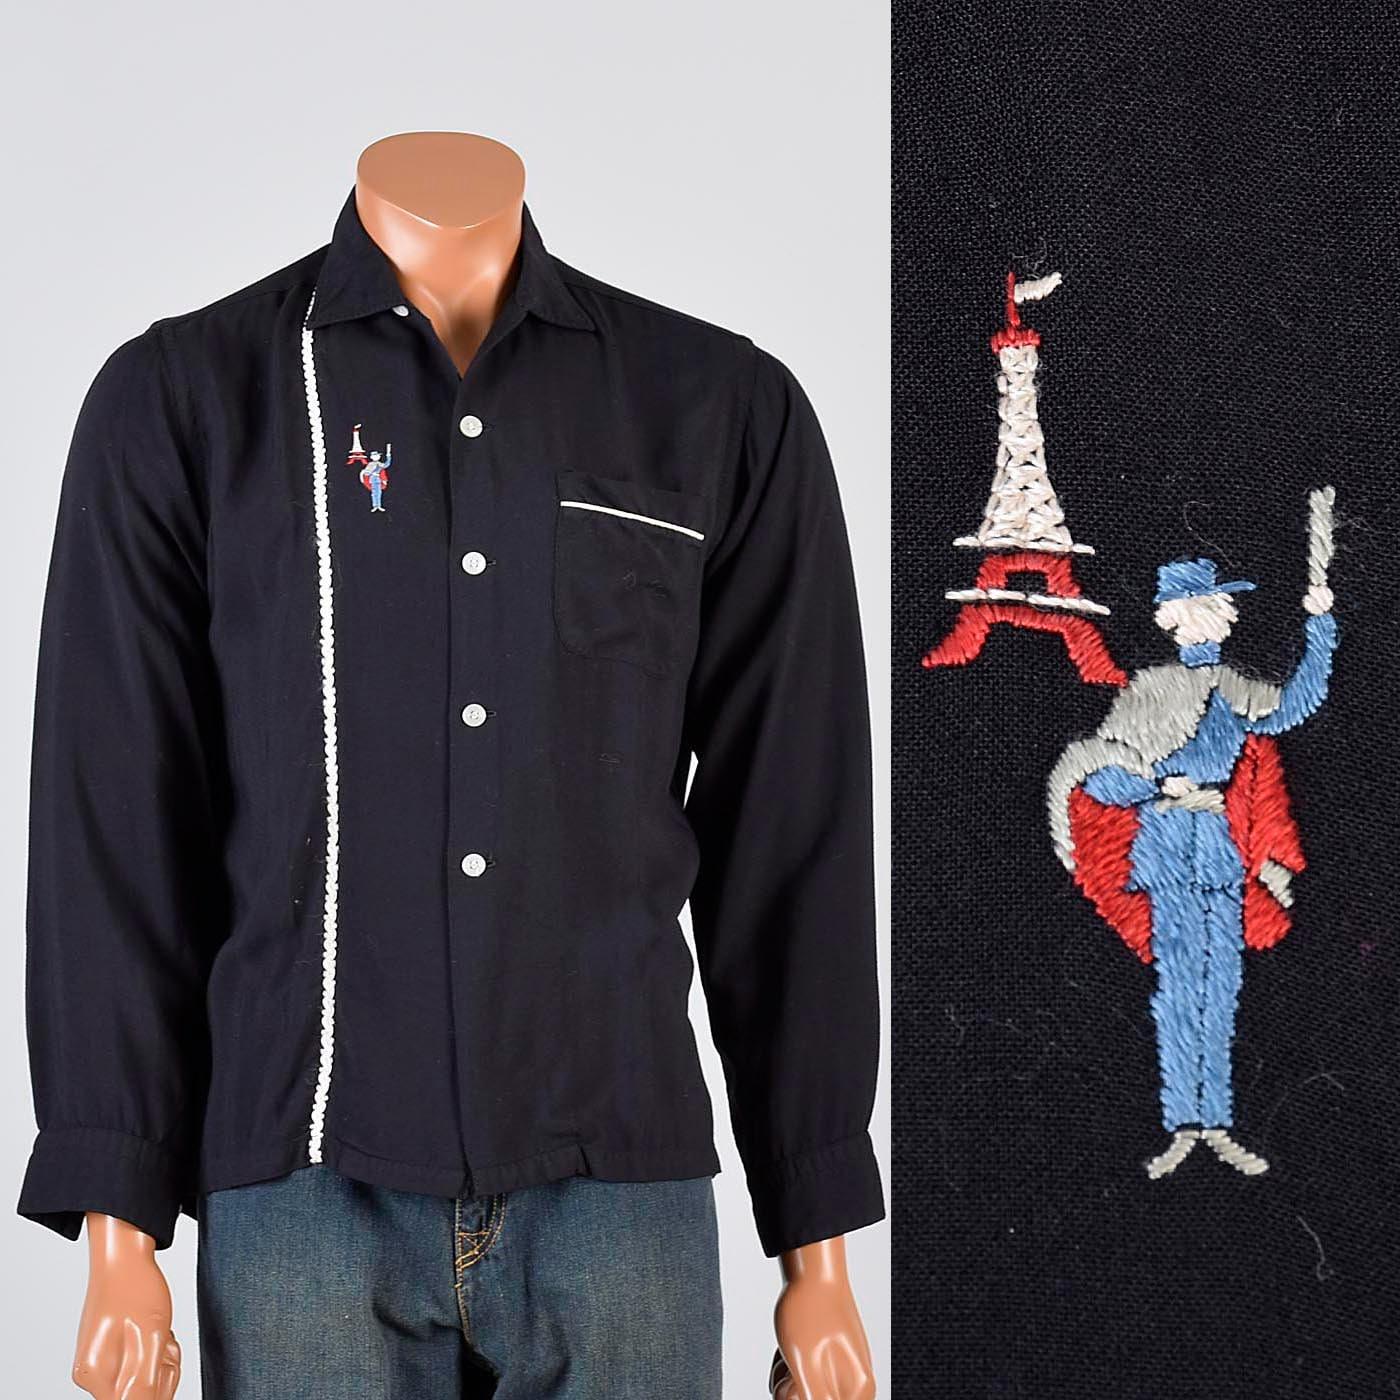 1950s Mens Hats | 50s Vintage Men's Hats Palm Springs 50S Shirt Mens Novelty Eiffel Tower Paris Black Loop Collar Long Sleeve Rockabilly 15 15.5 $0.00 AT vintagedancer.com